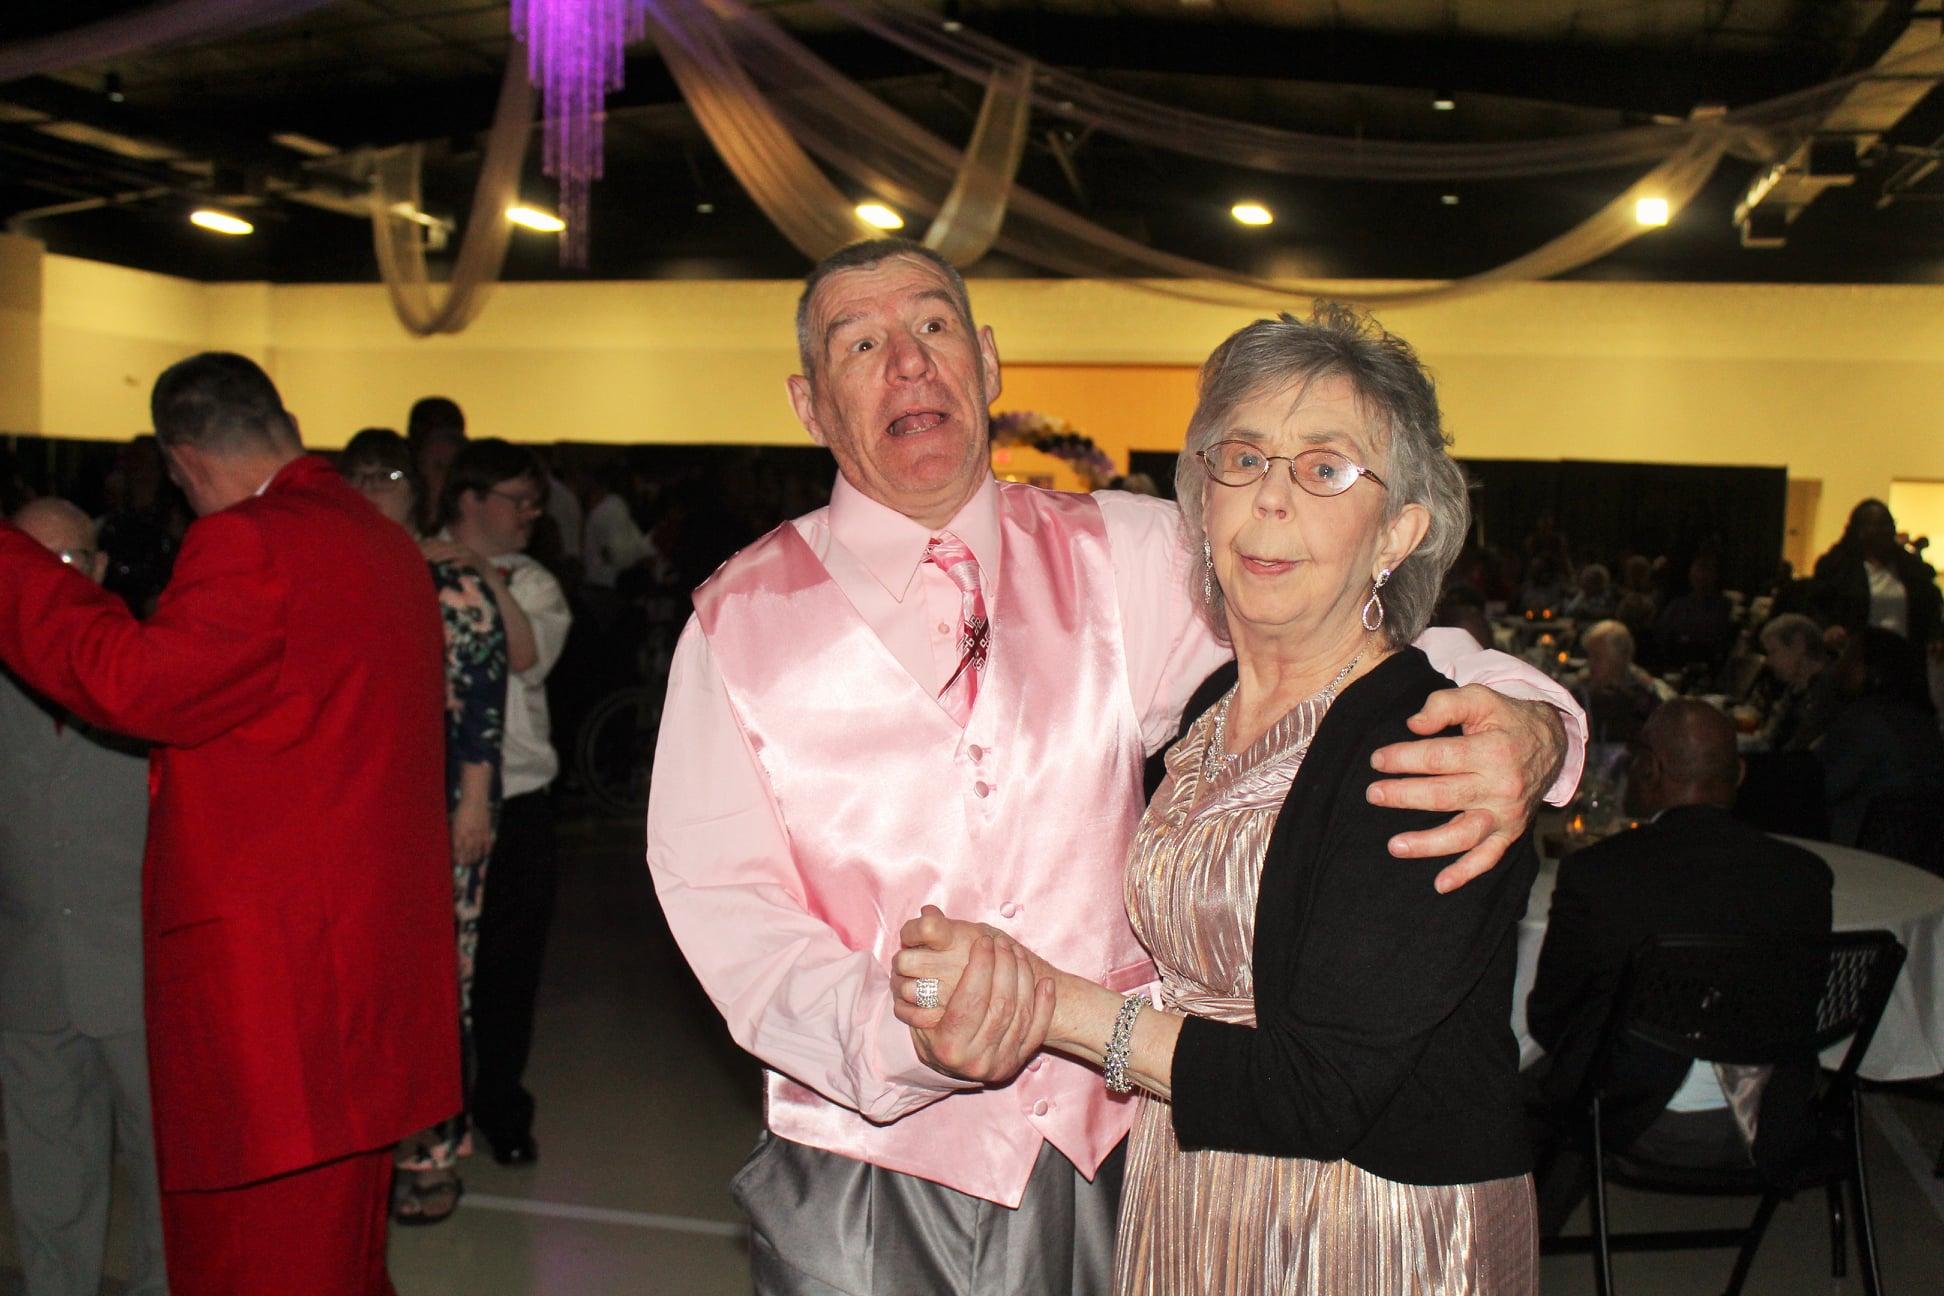 Dancing at the Burton Center Ball 2019